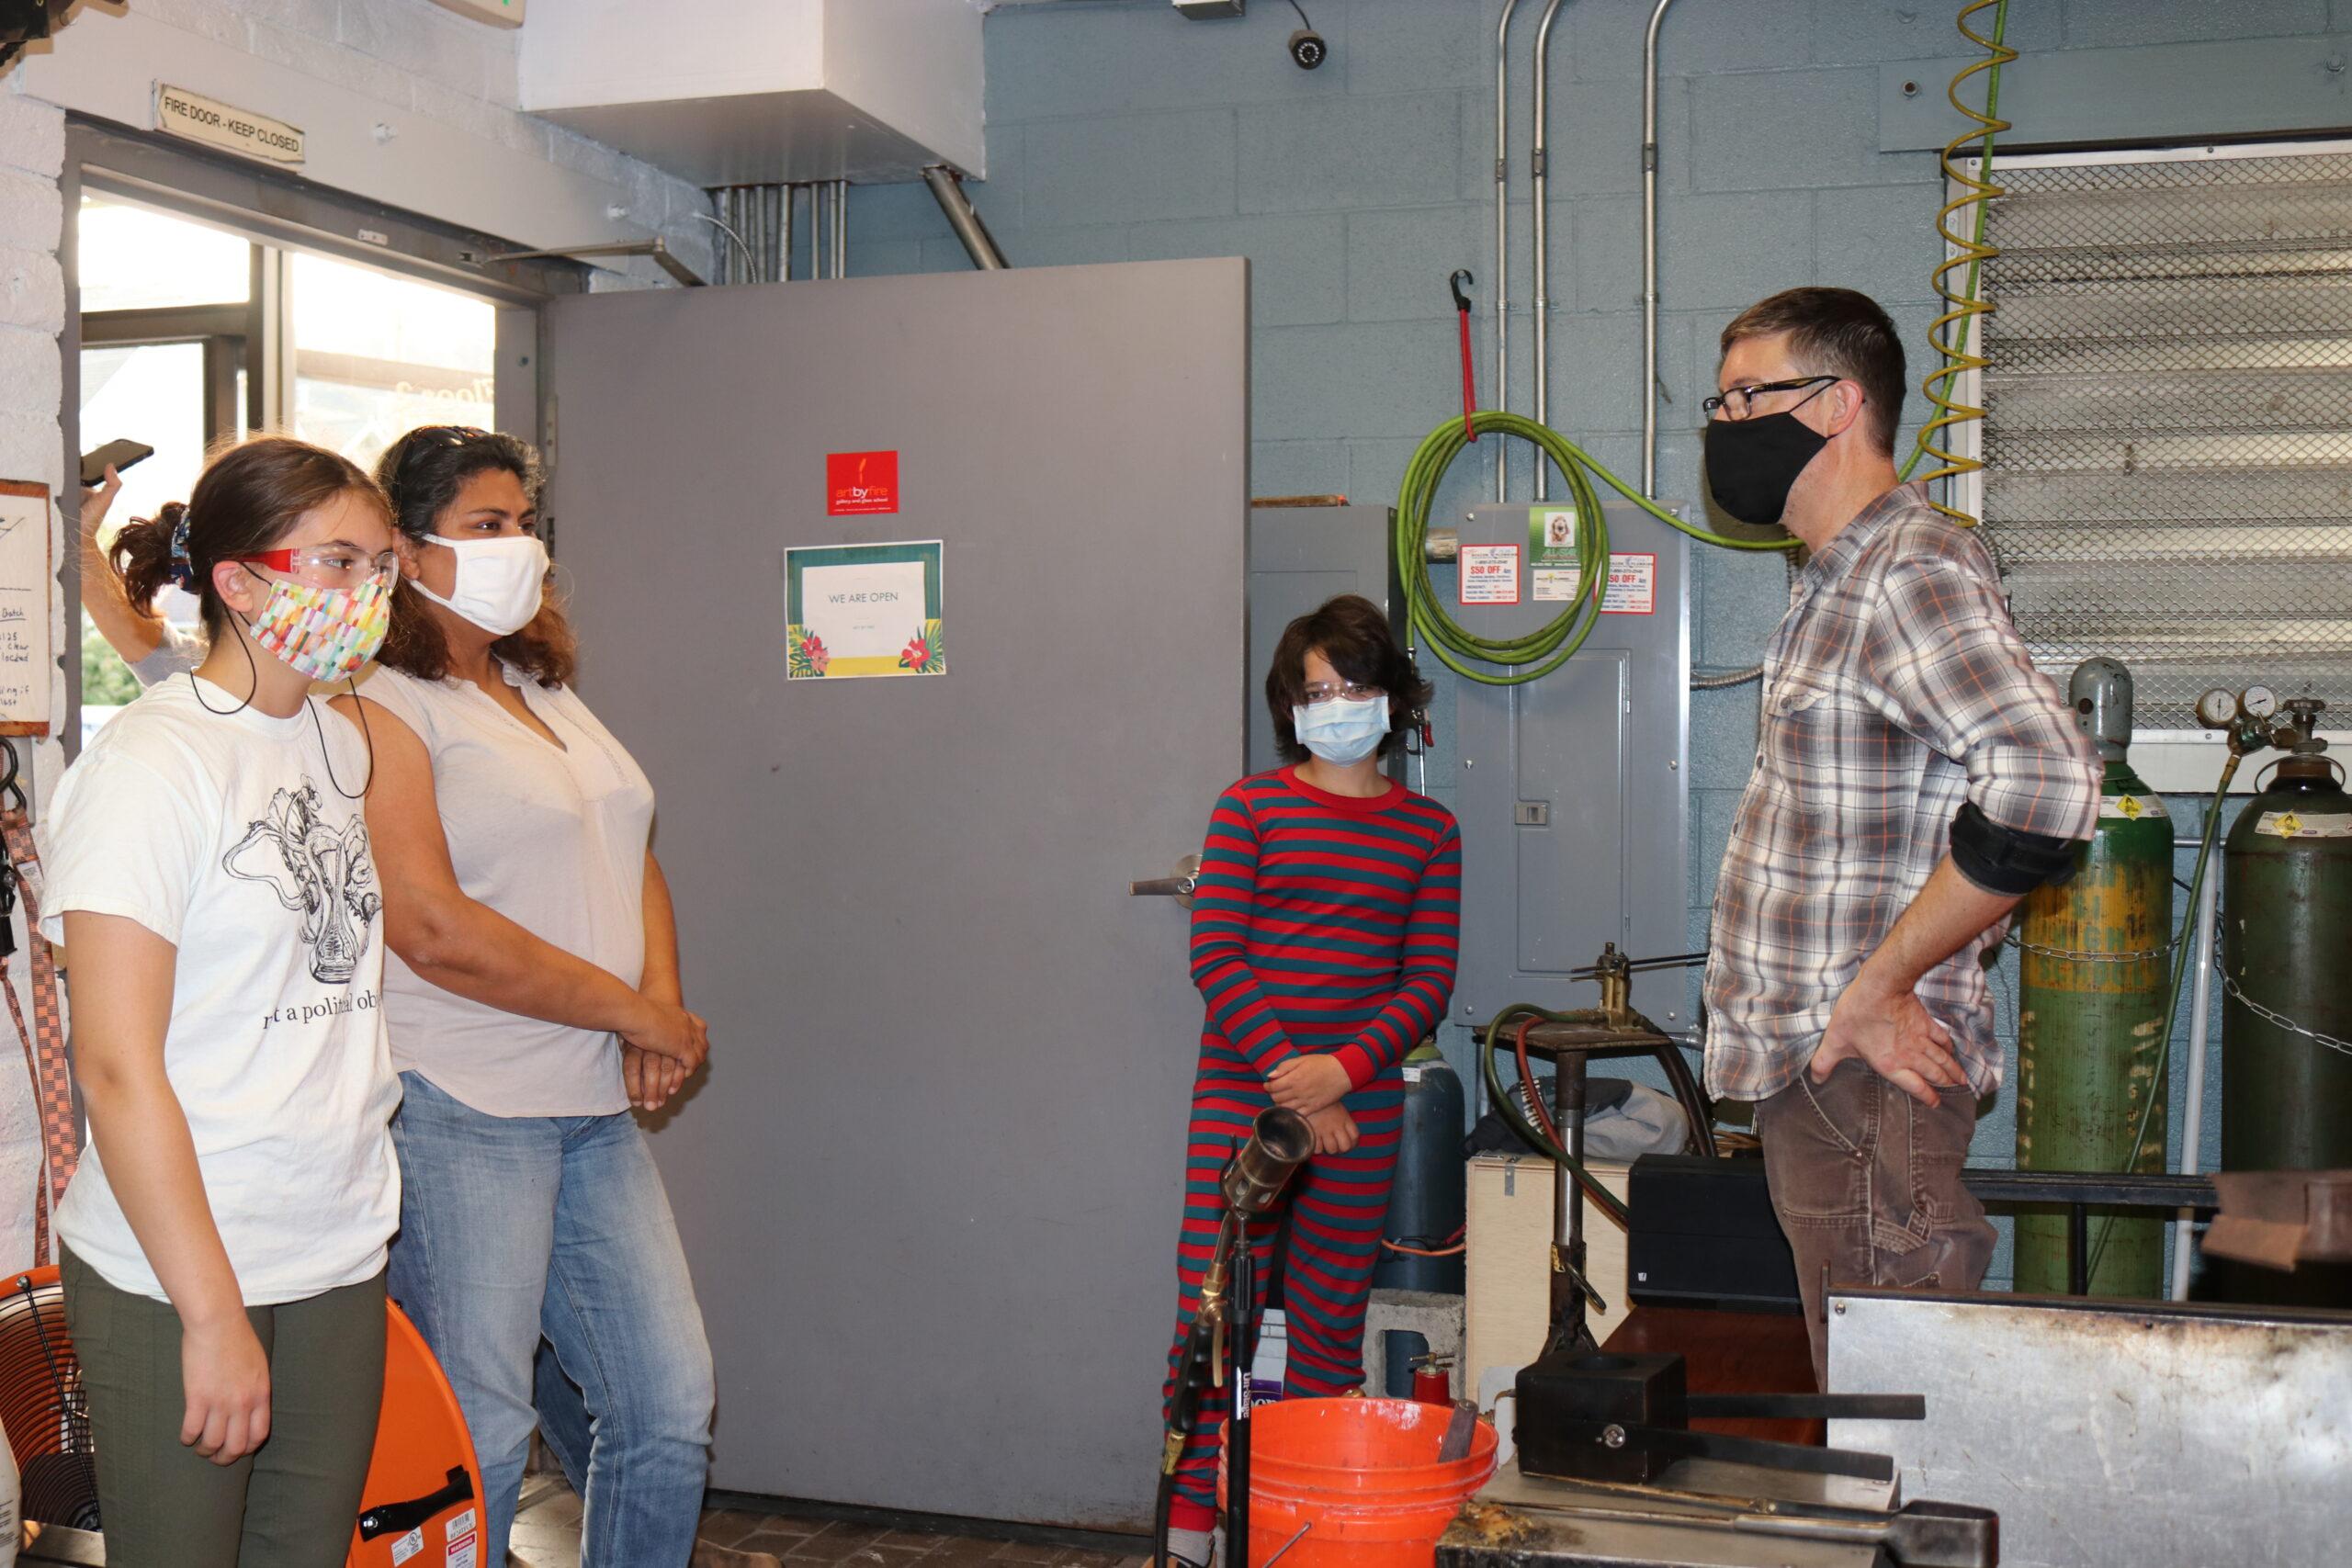 4 people in glass blowing studio